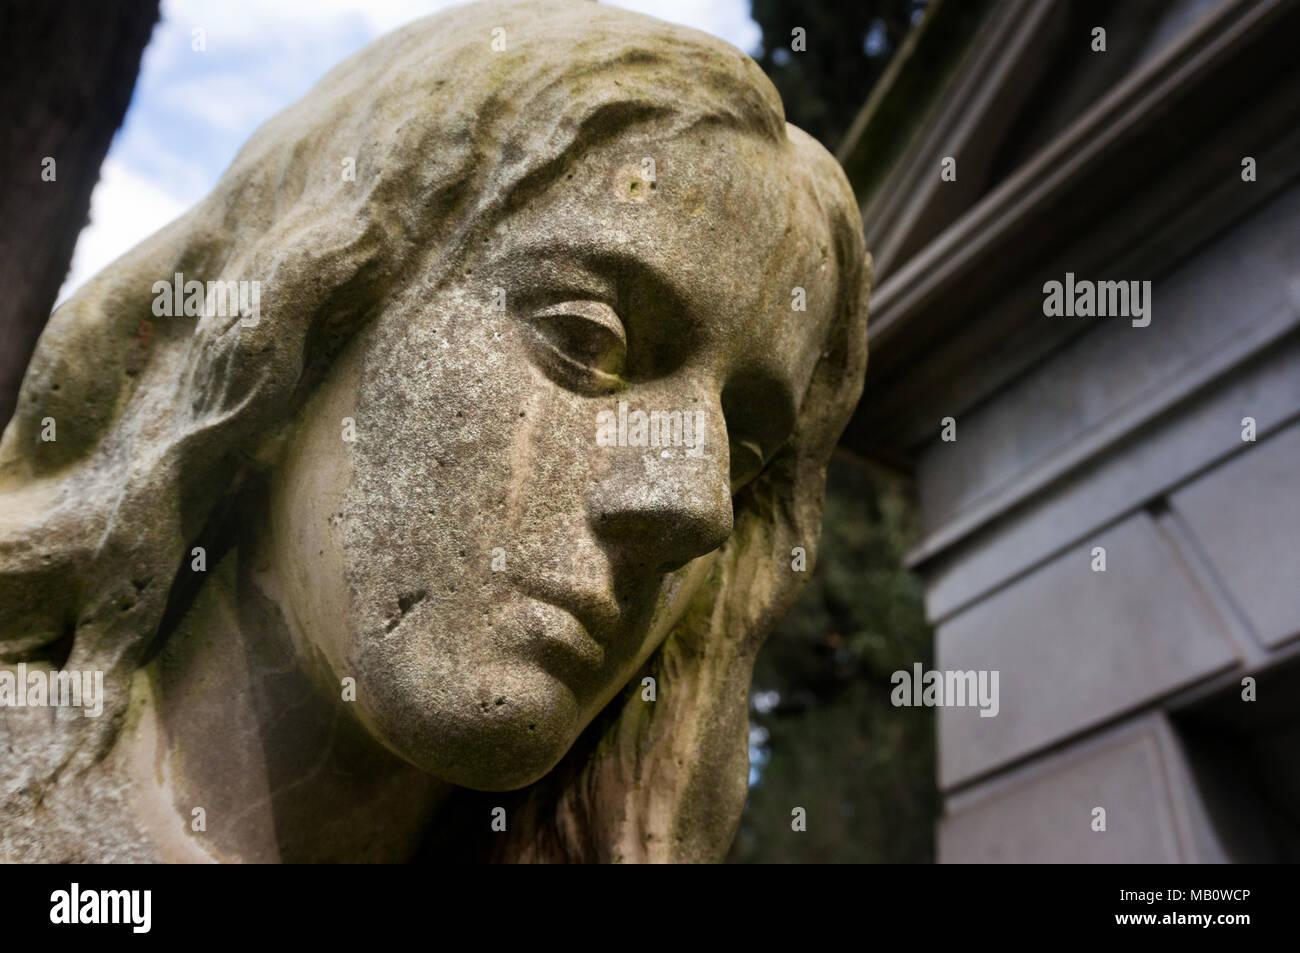 Mute desperation - Protestant Cemetery - Rome - Stock Image